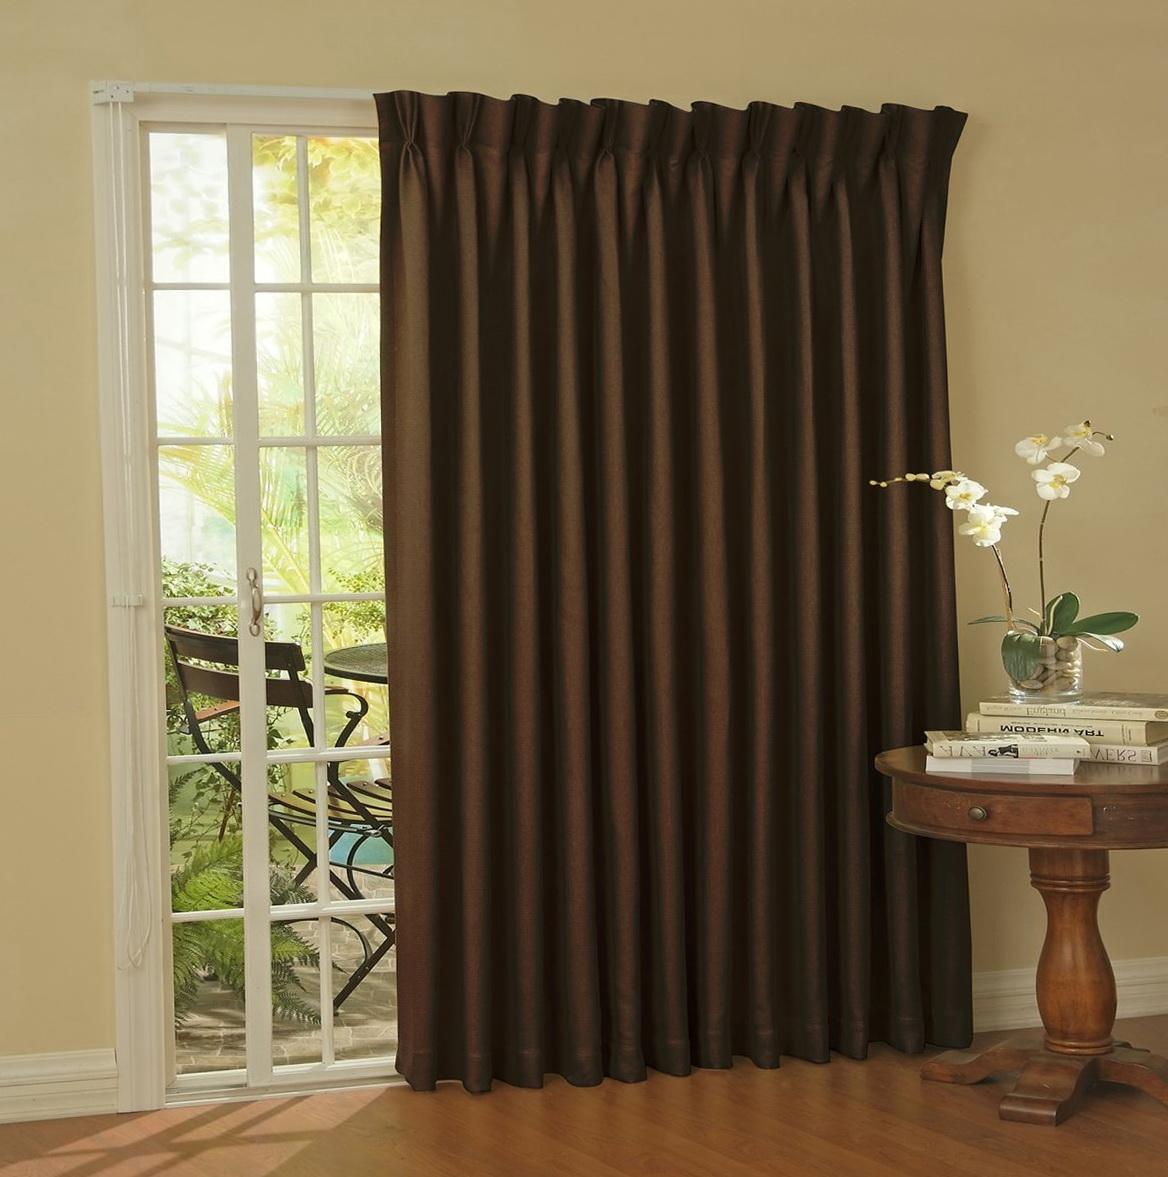 Noise Cancelling Curtains Amazon